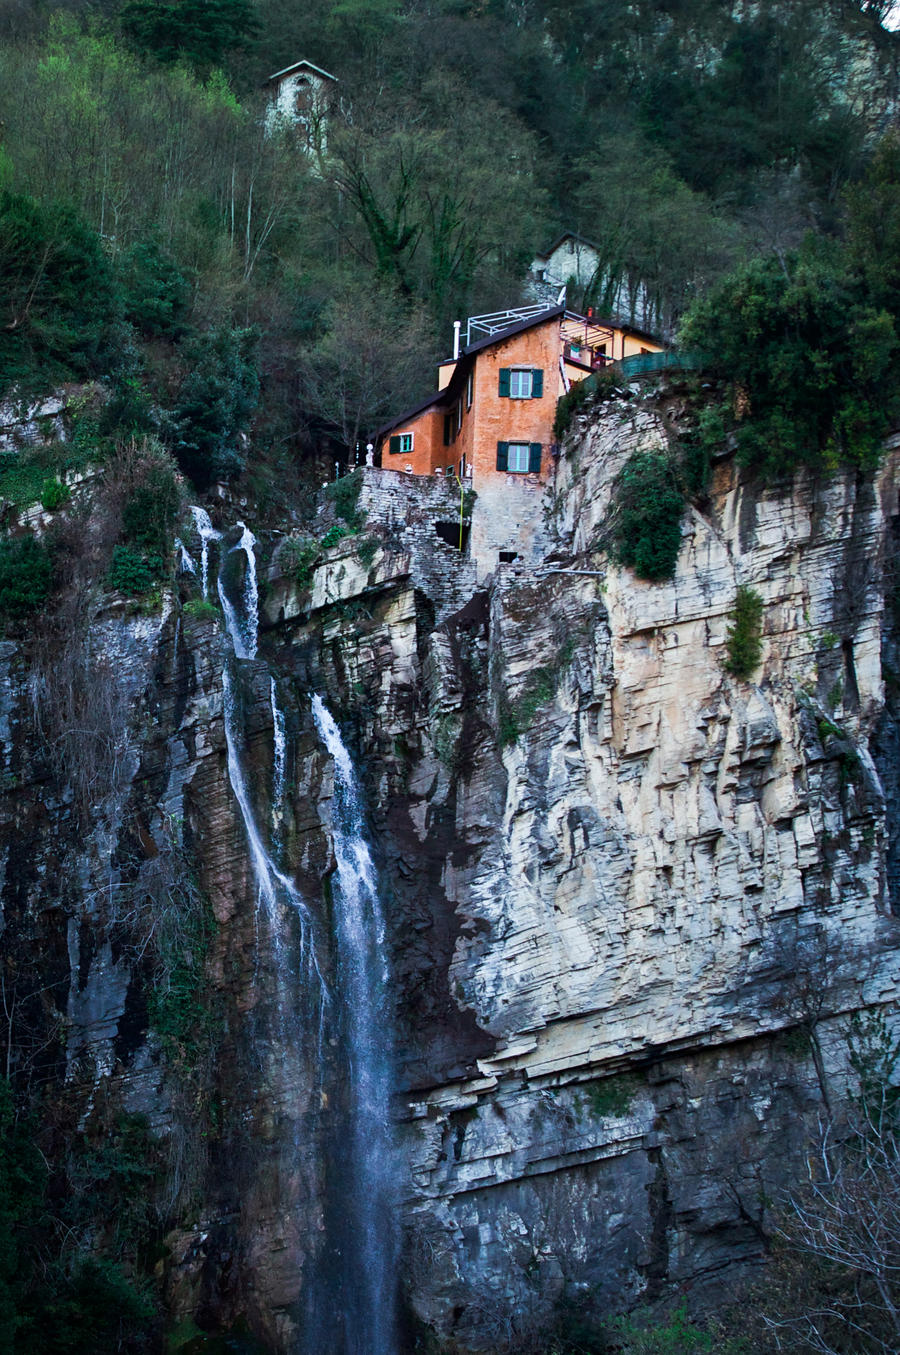 Waterfall Villa by OEMminus